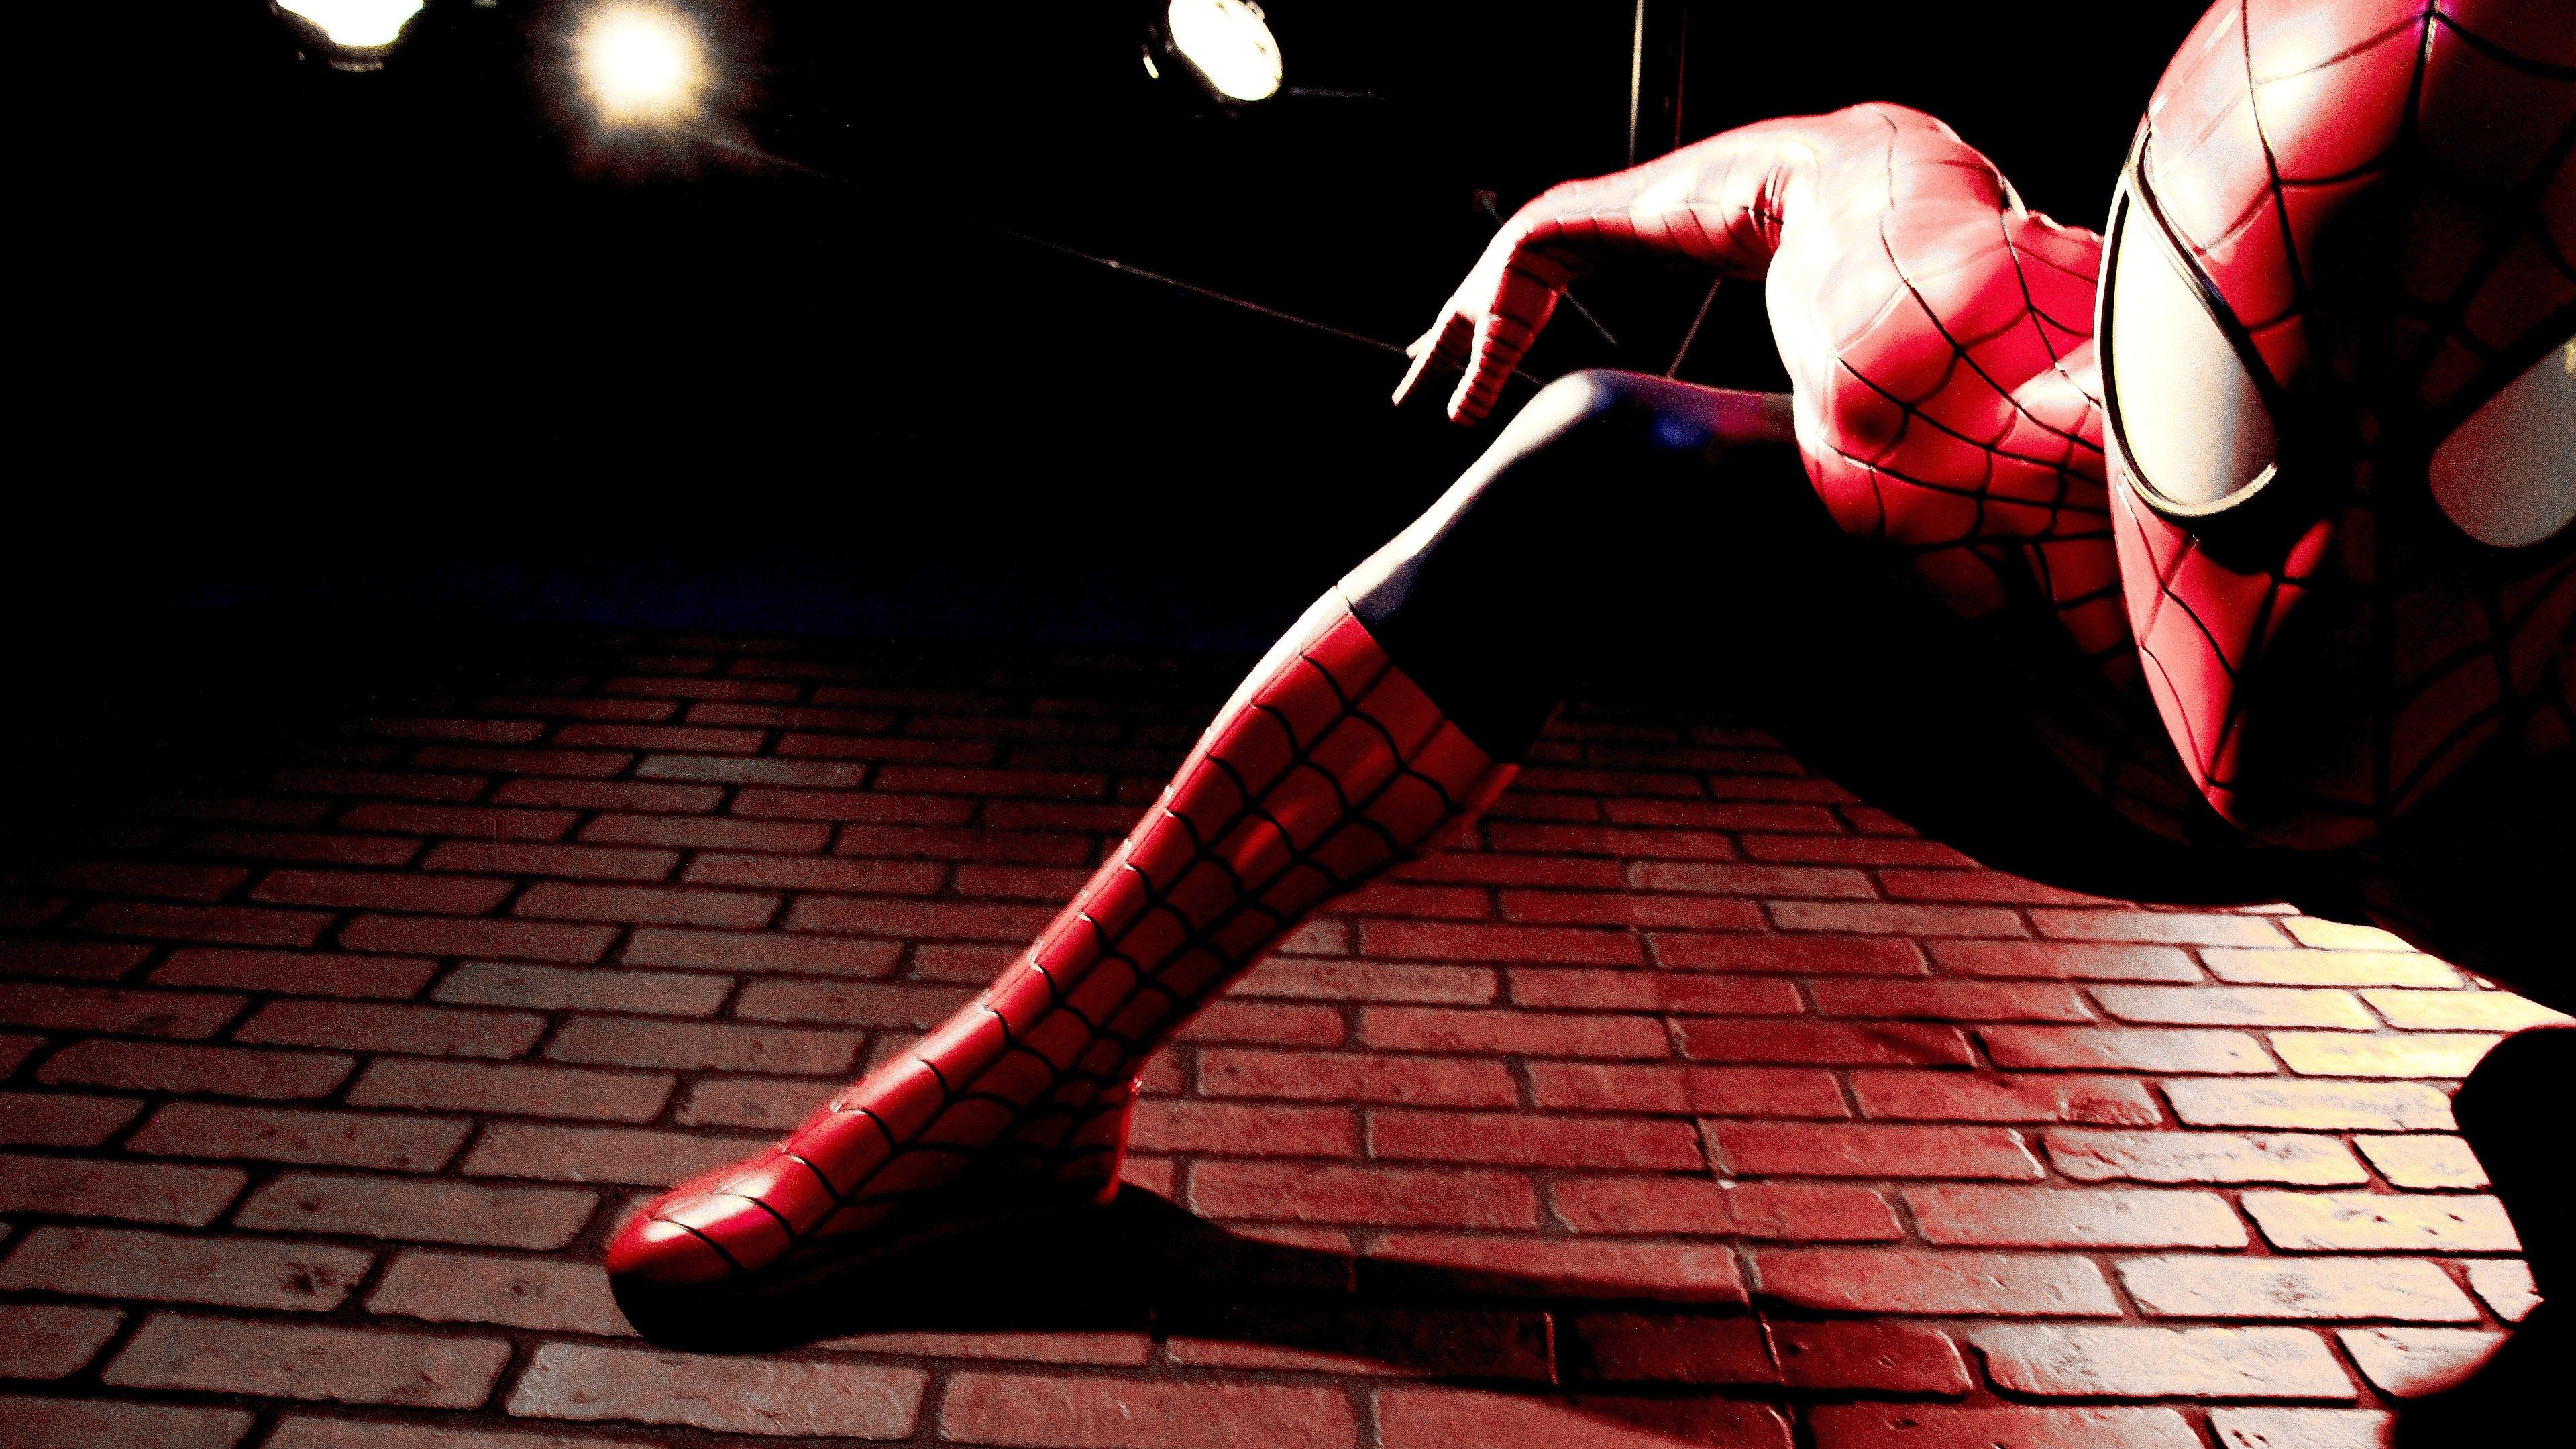 Wallpaper 4k Spider Man Cosplay 4k 4kwallpapers, 5k